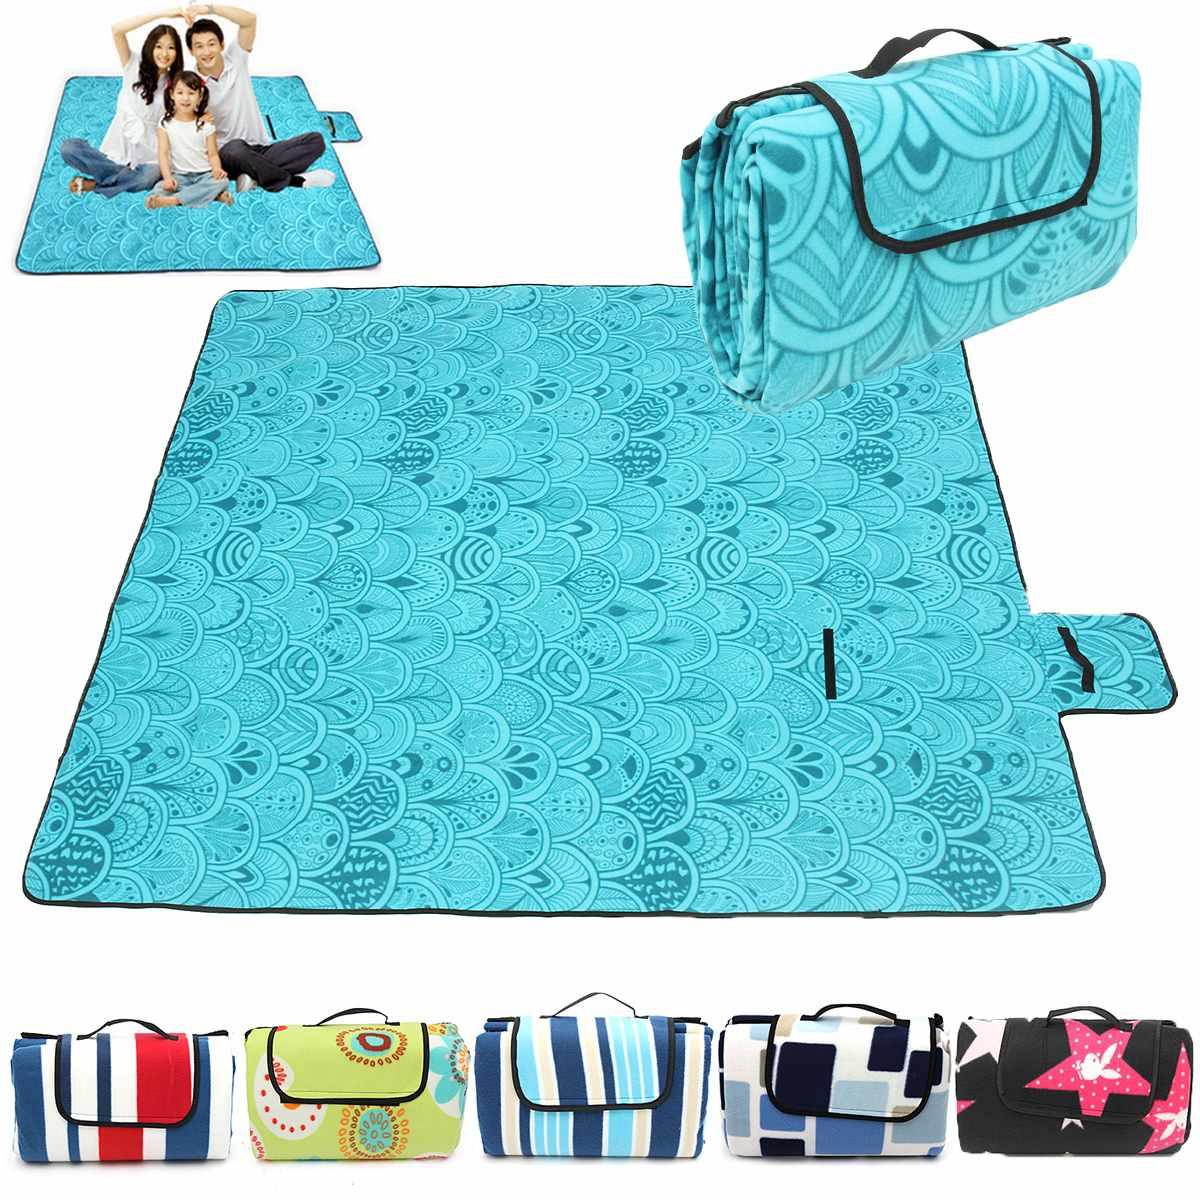 Large Picnic Blanket Portable Mat